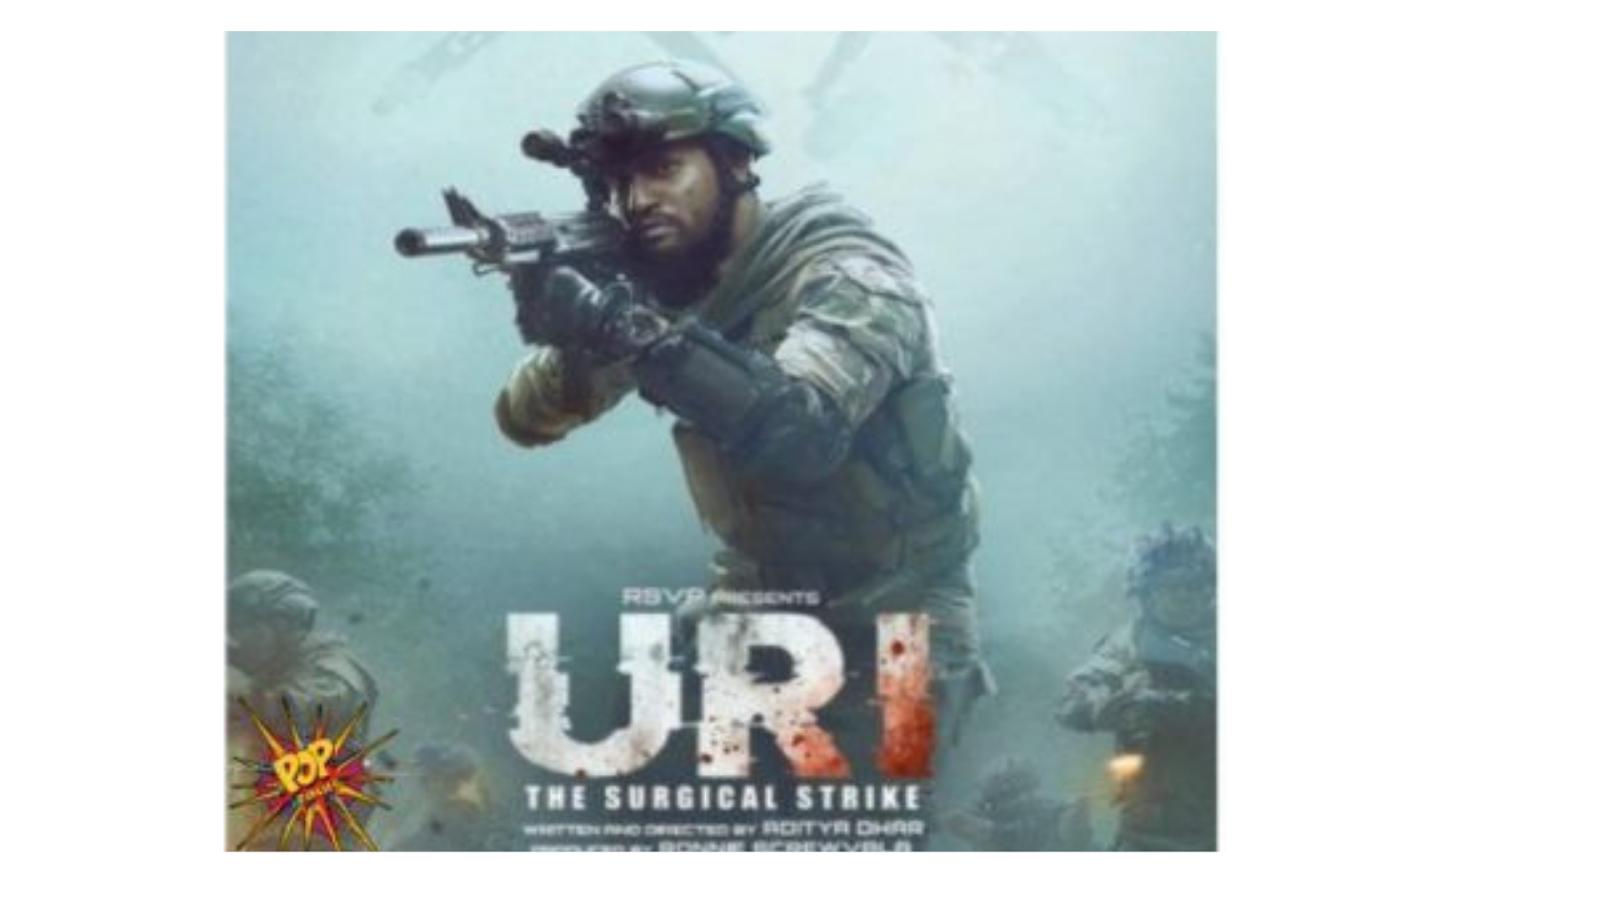 Uri The Surgical Strike Movie Download In Hd 720p Mp4moviezhd Mp4